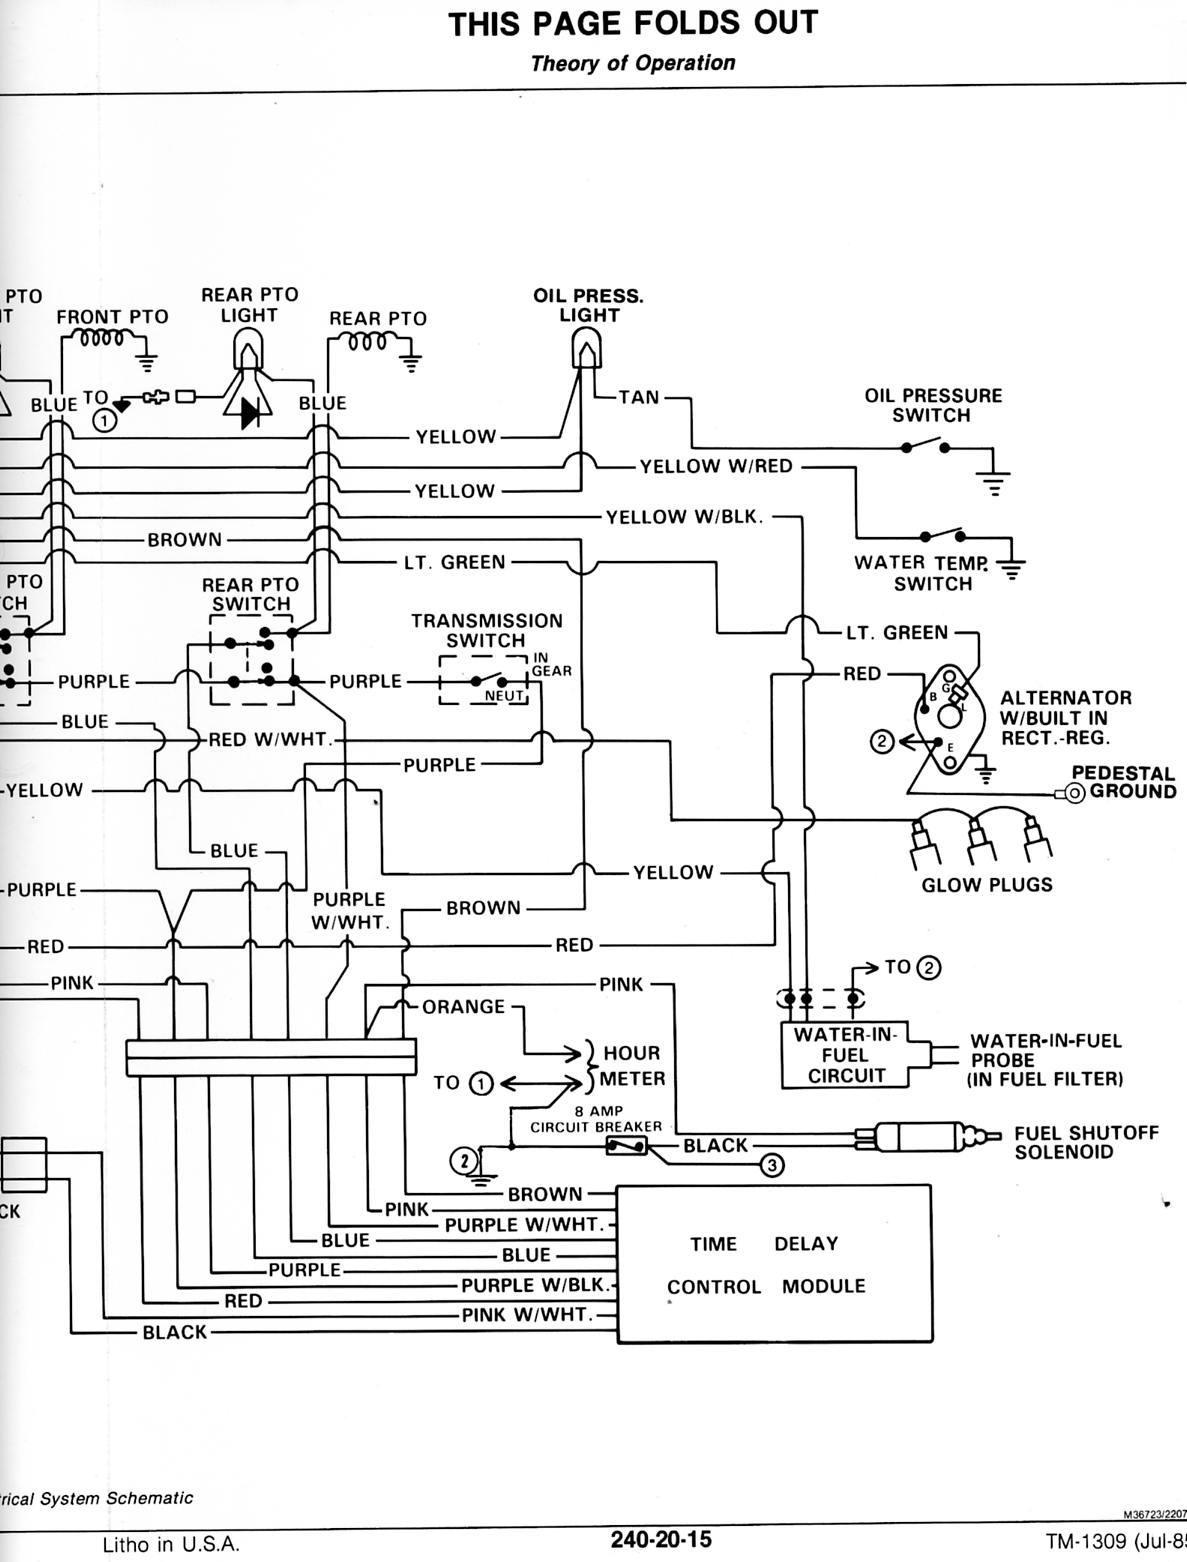 [SF_0340] 1070 Case Wiring Diagram Free Diagram